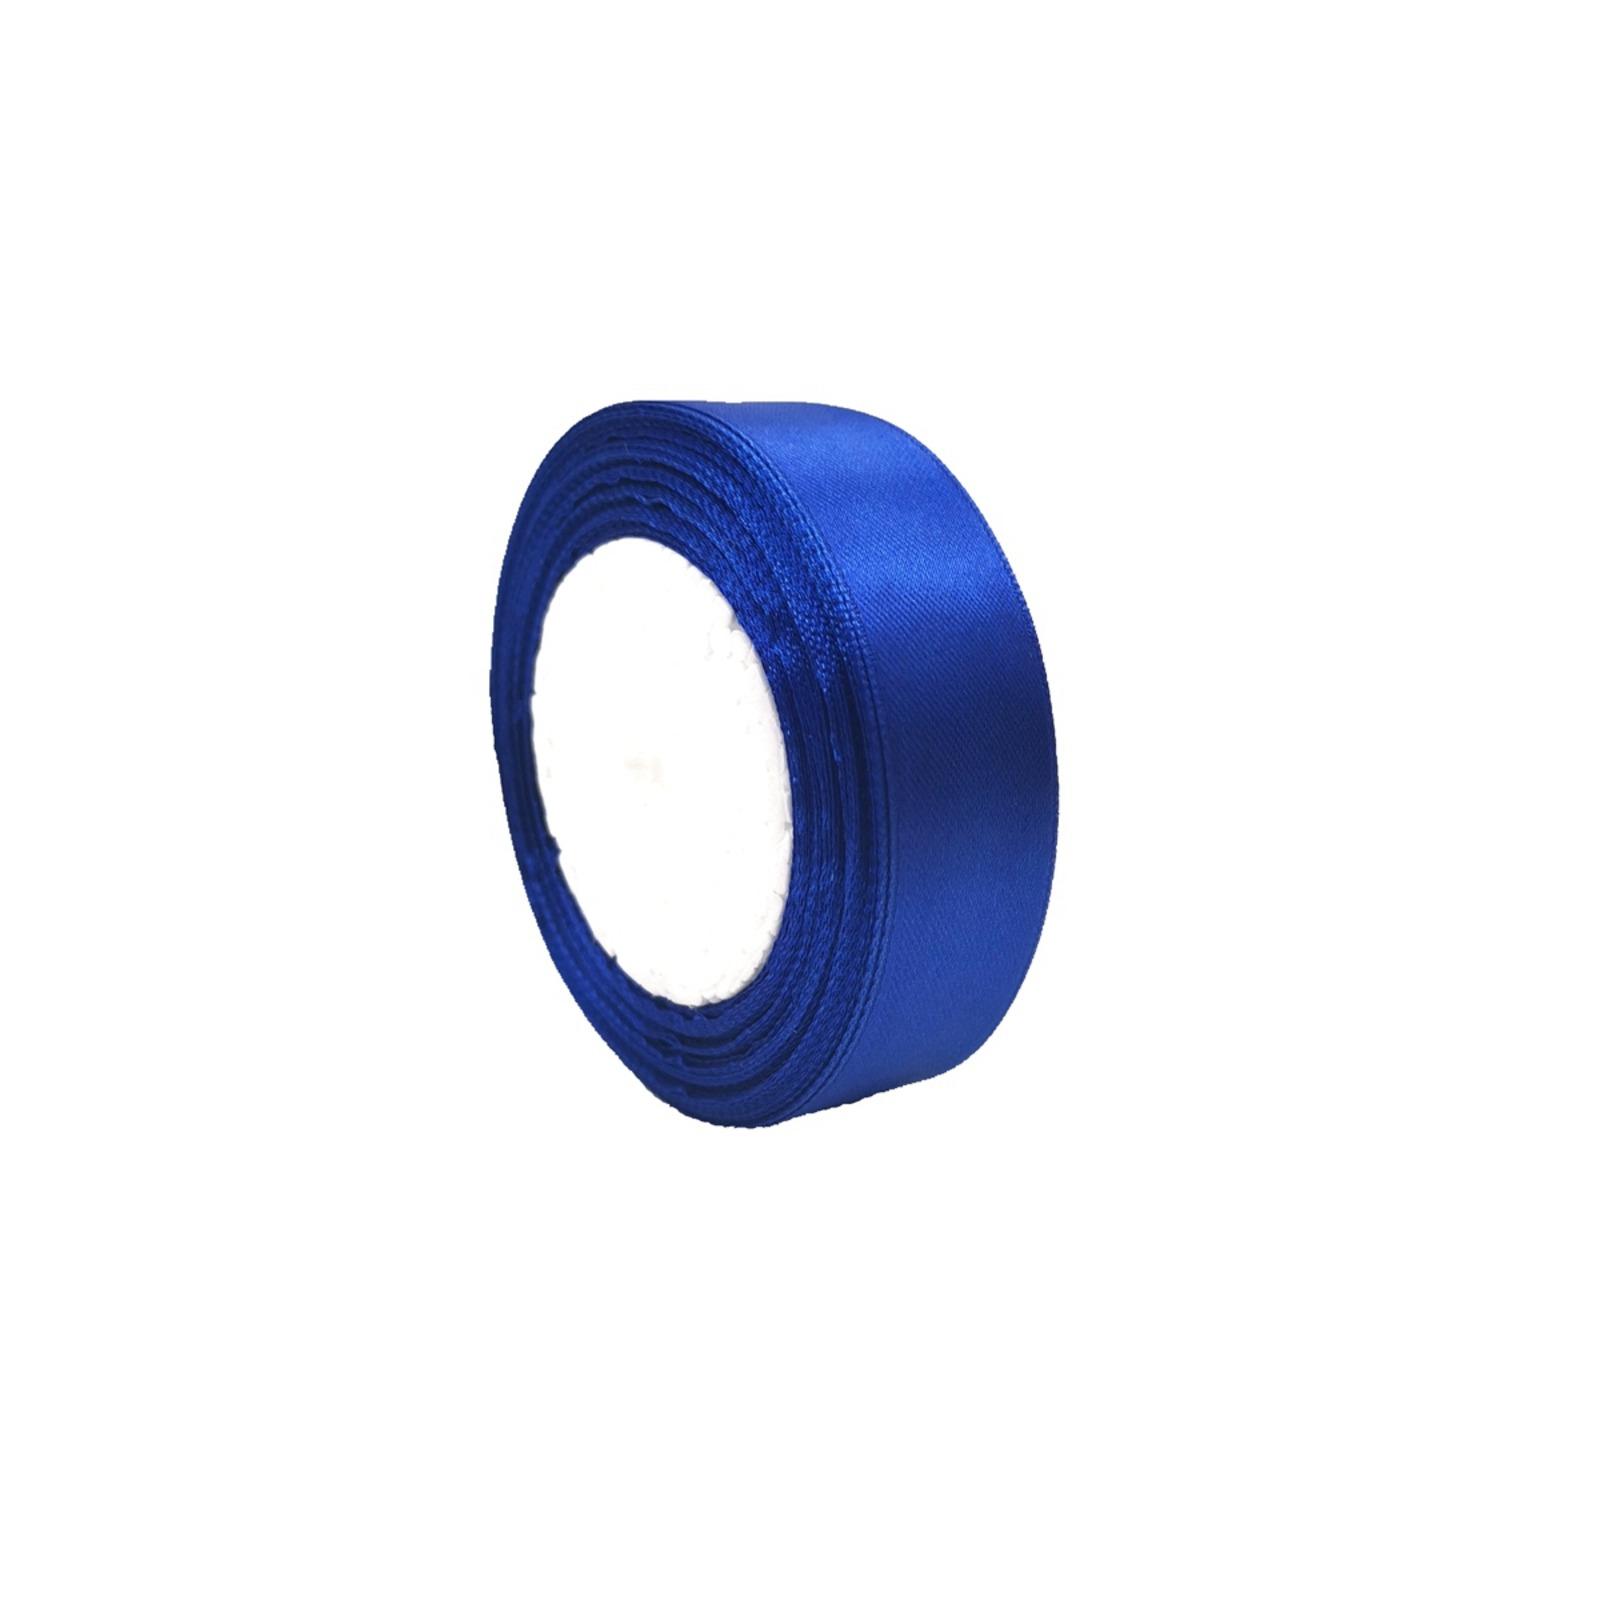 VIP Ribbon 2.5cm x 22.5m - Dark Blue